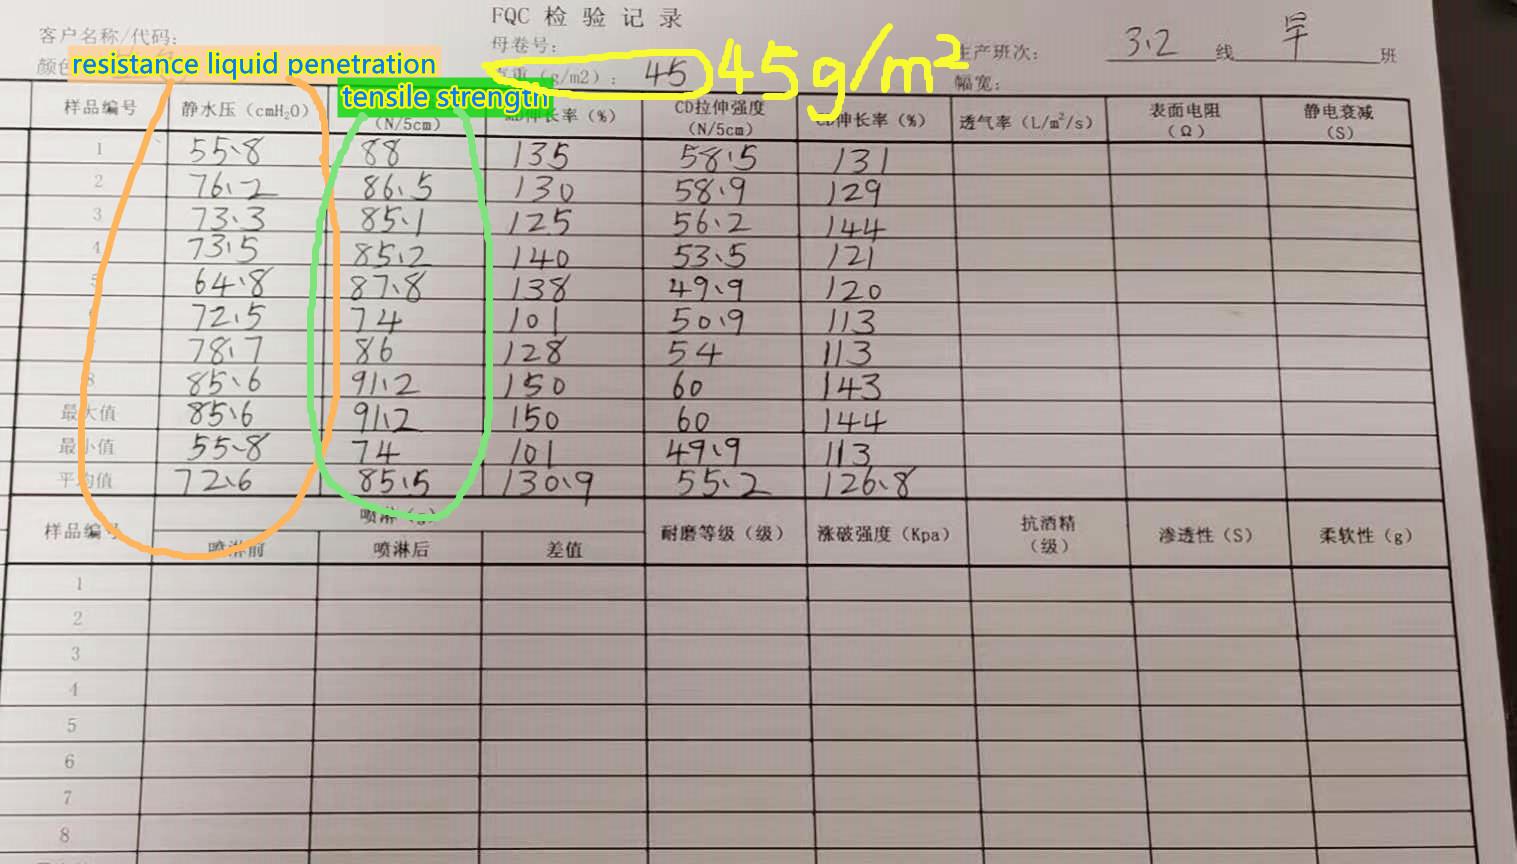 45gsm self test report